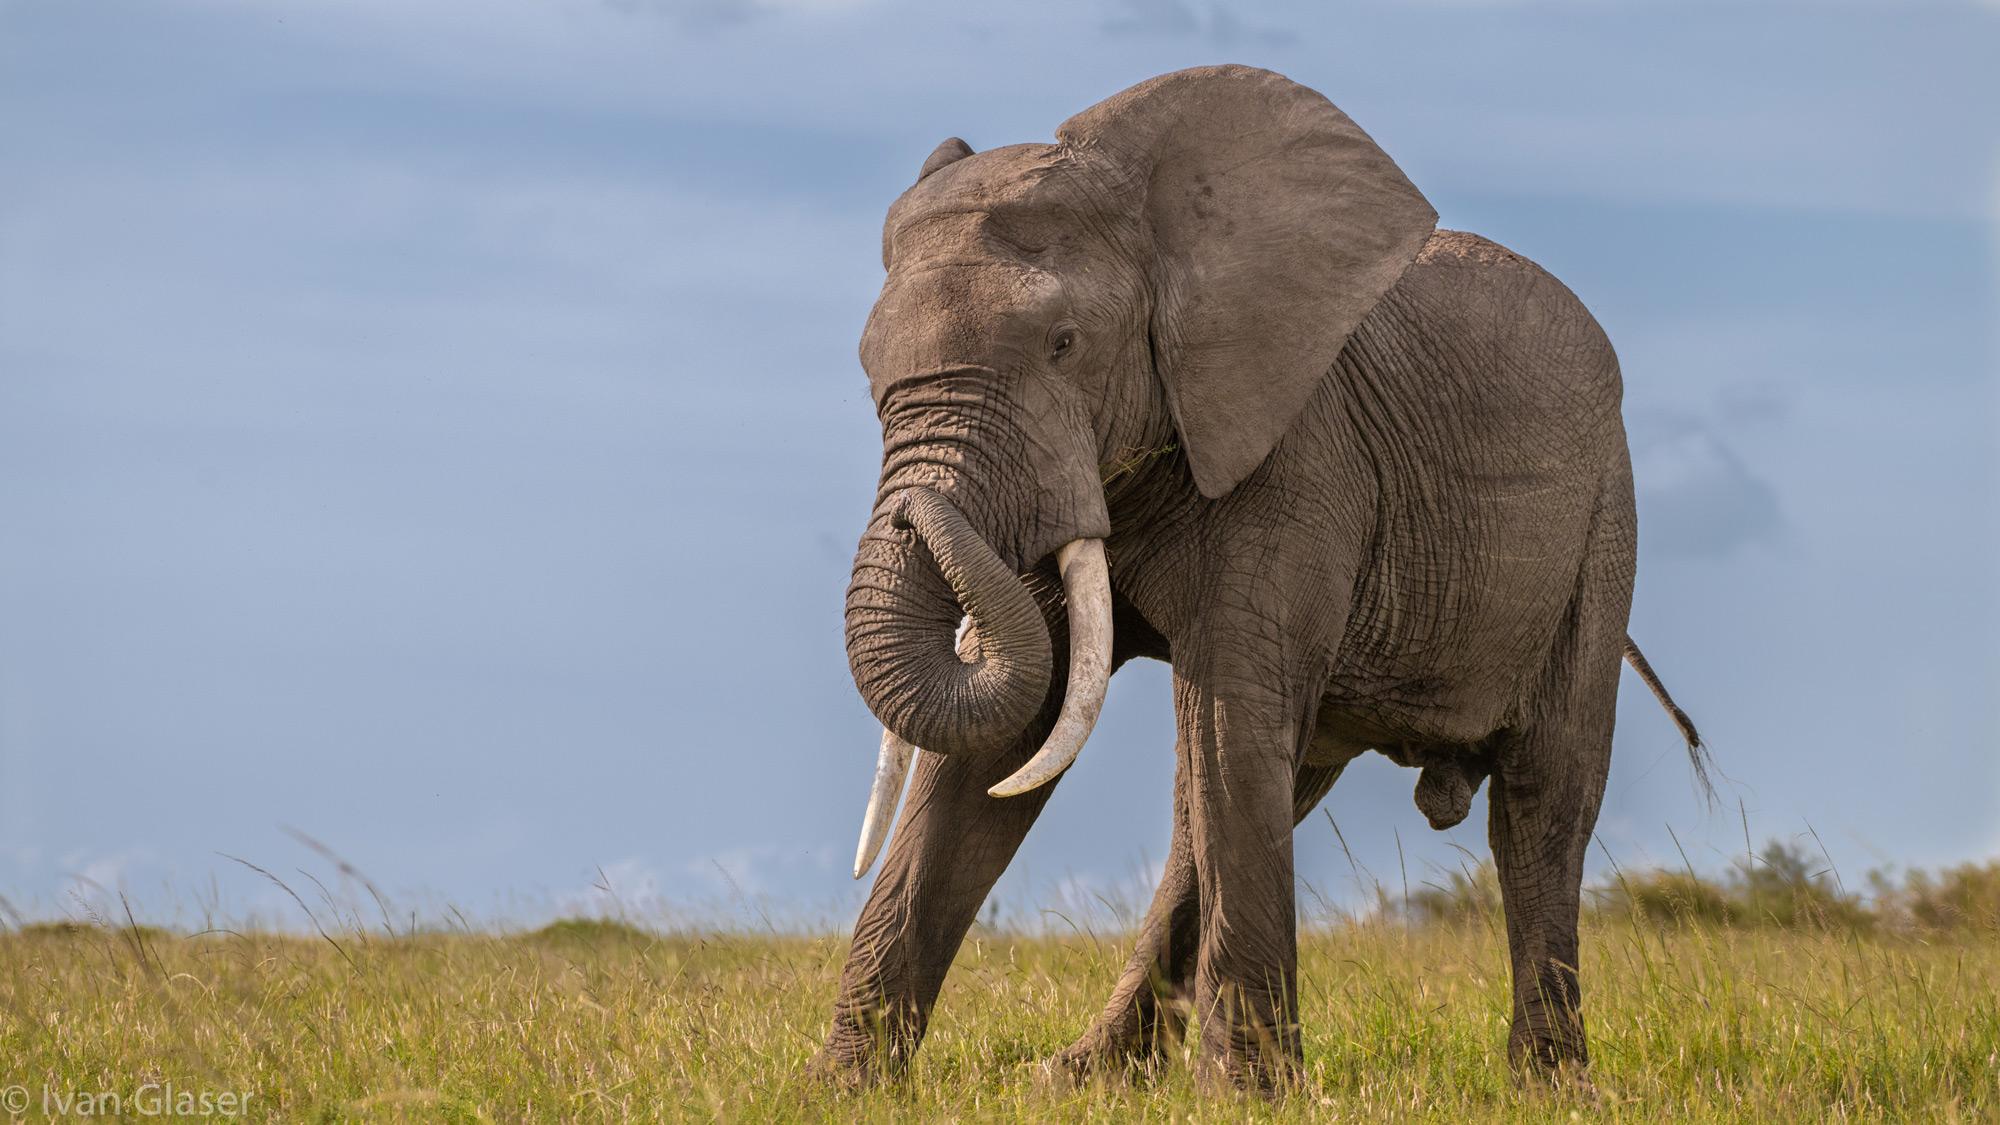 An elephant in Maasai Mara